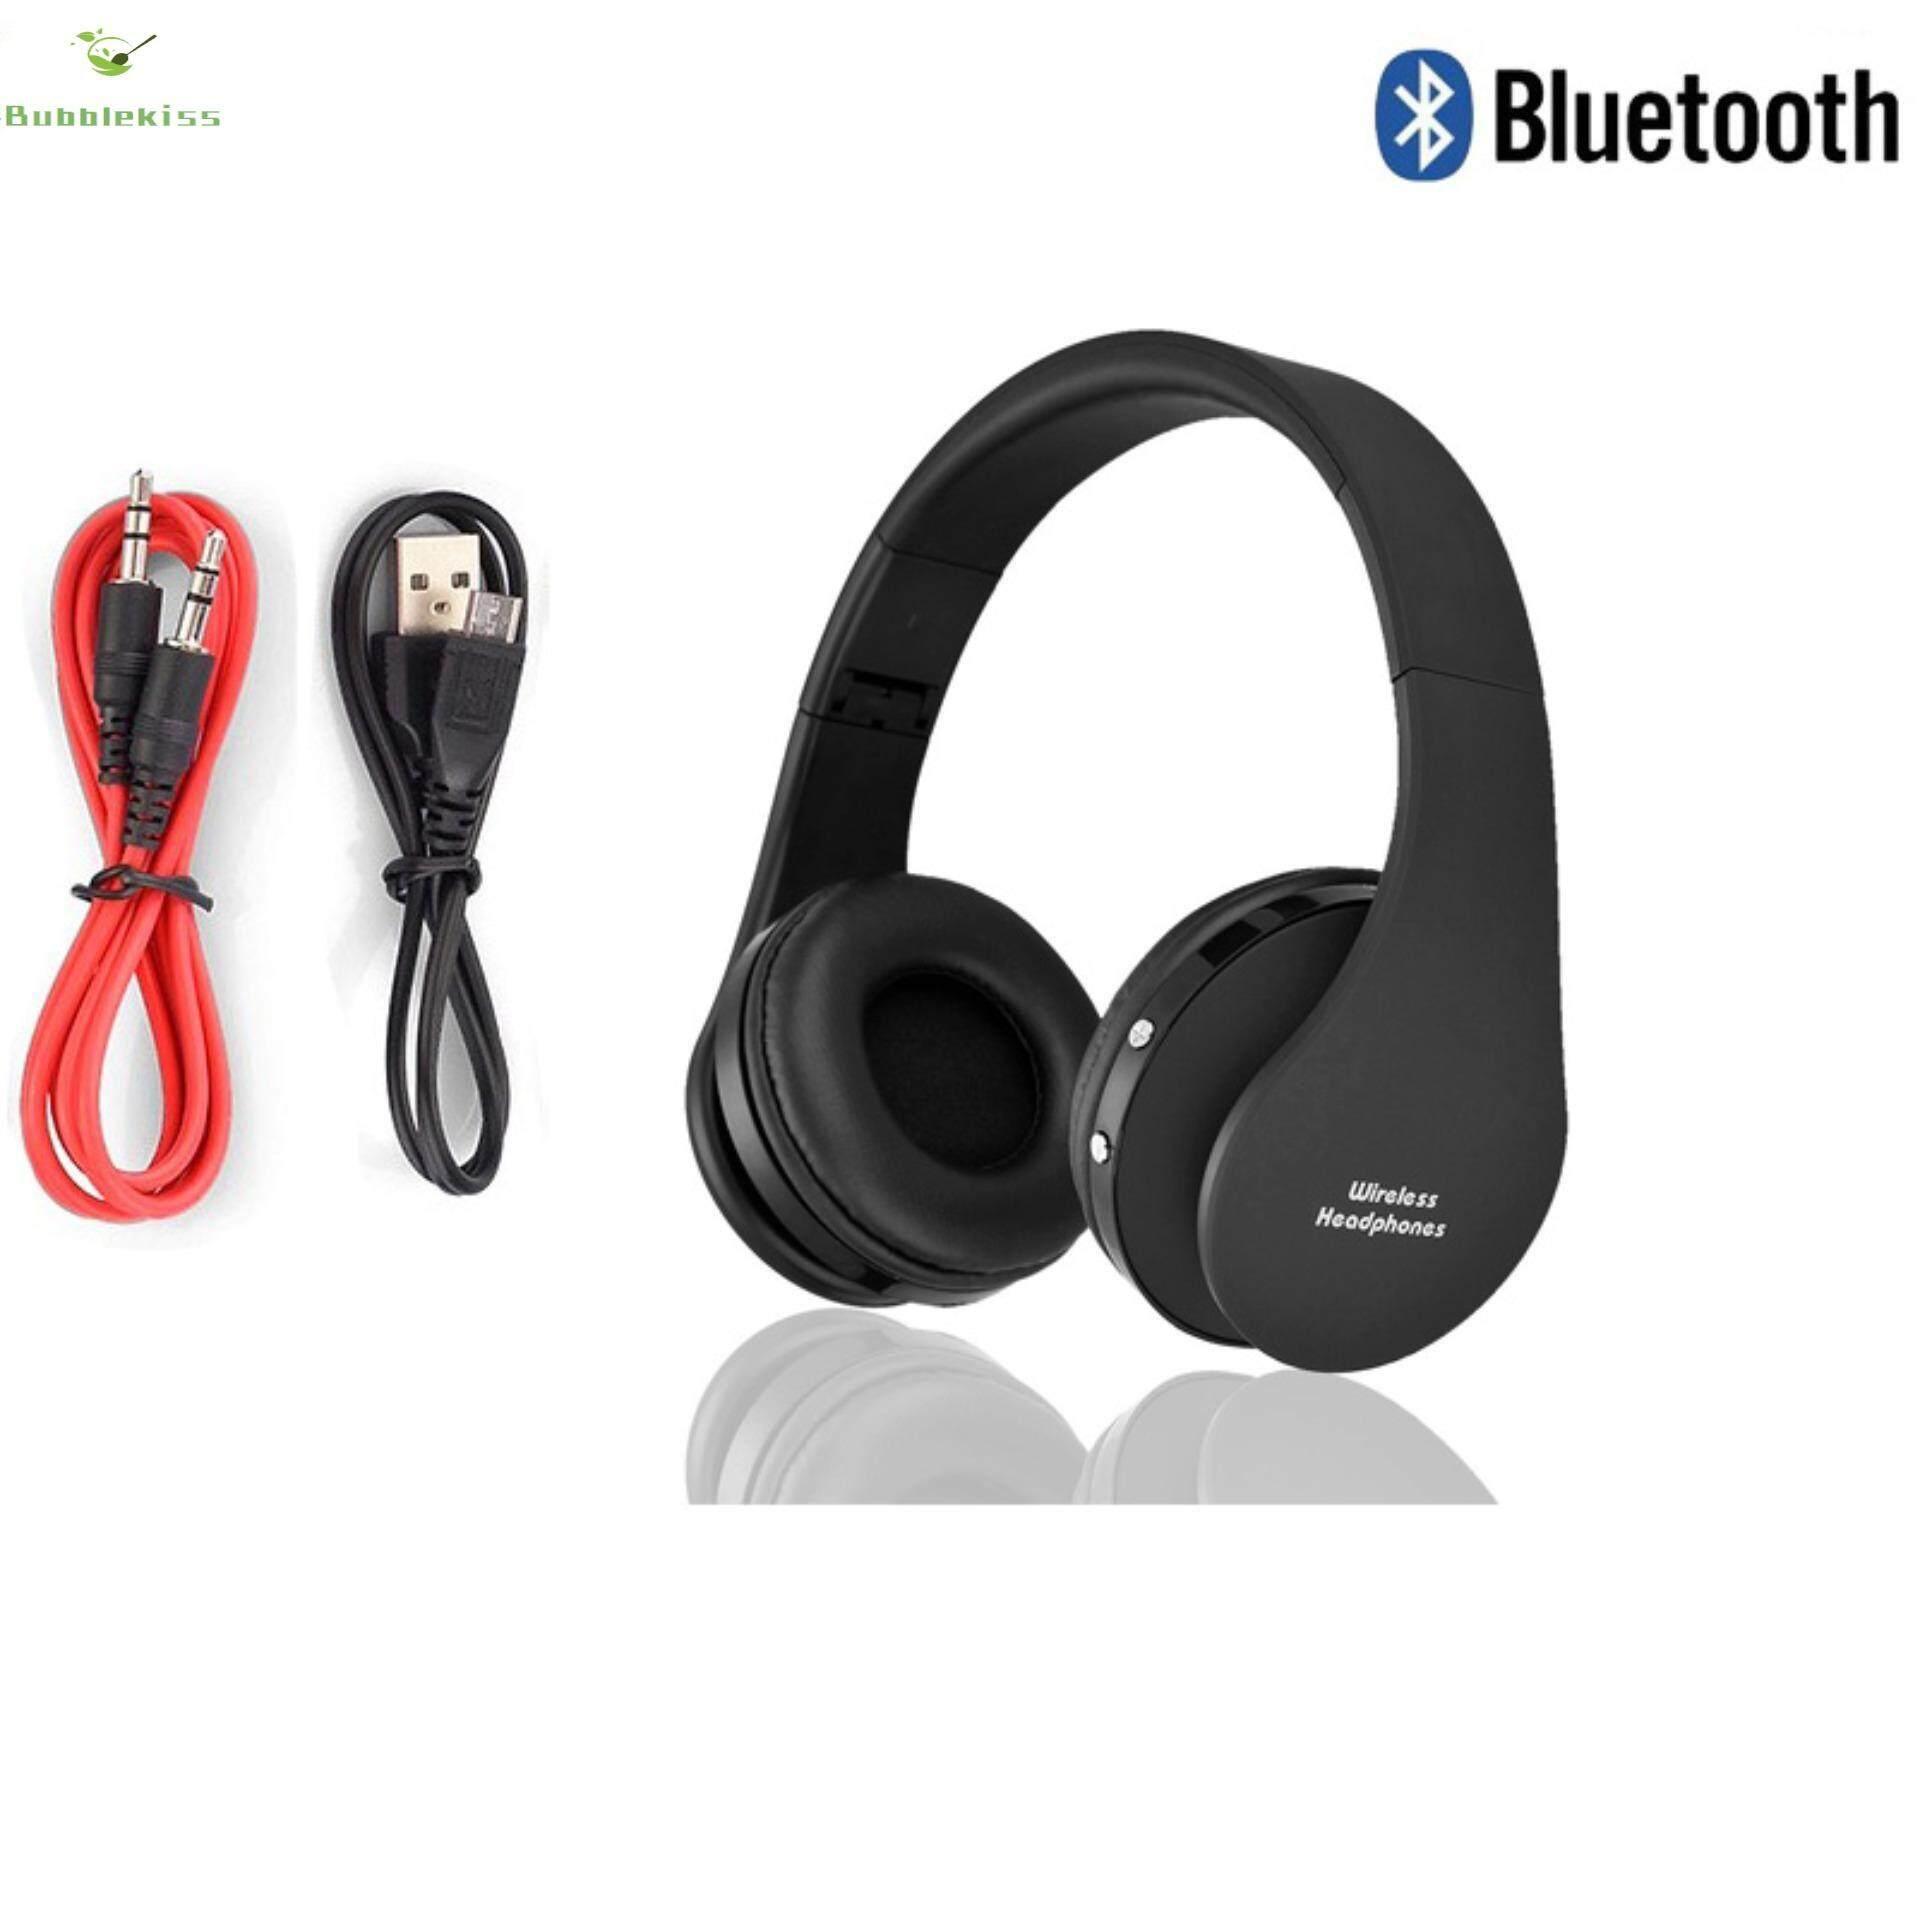 NX-8252 Musik Stereo Headphone S Nirkabel Headphone Siaga Headset Yang Nyaman